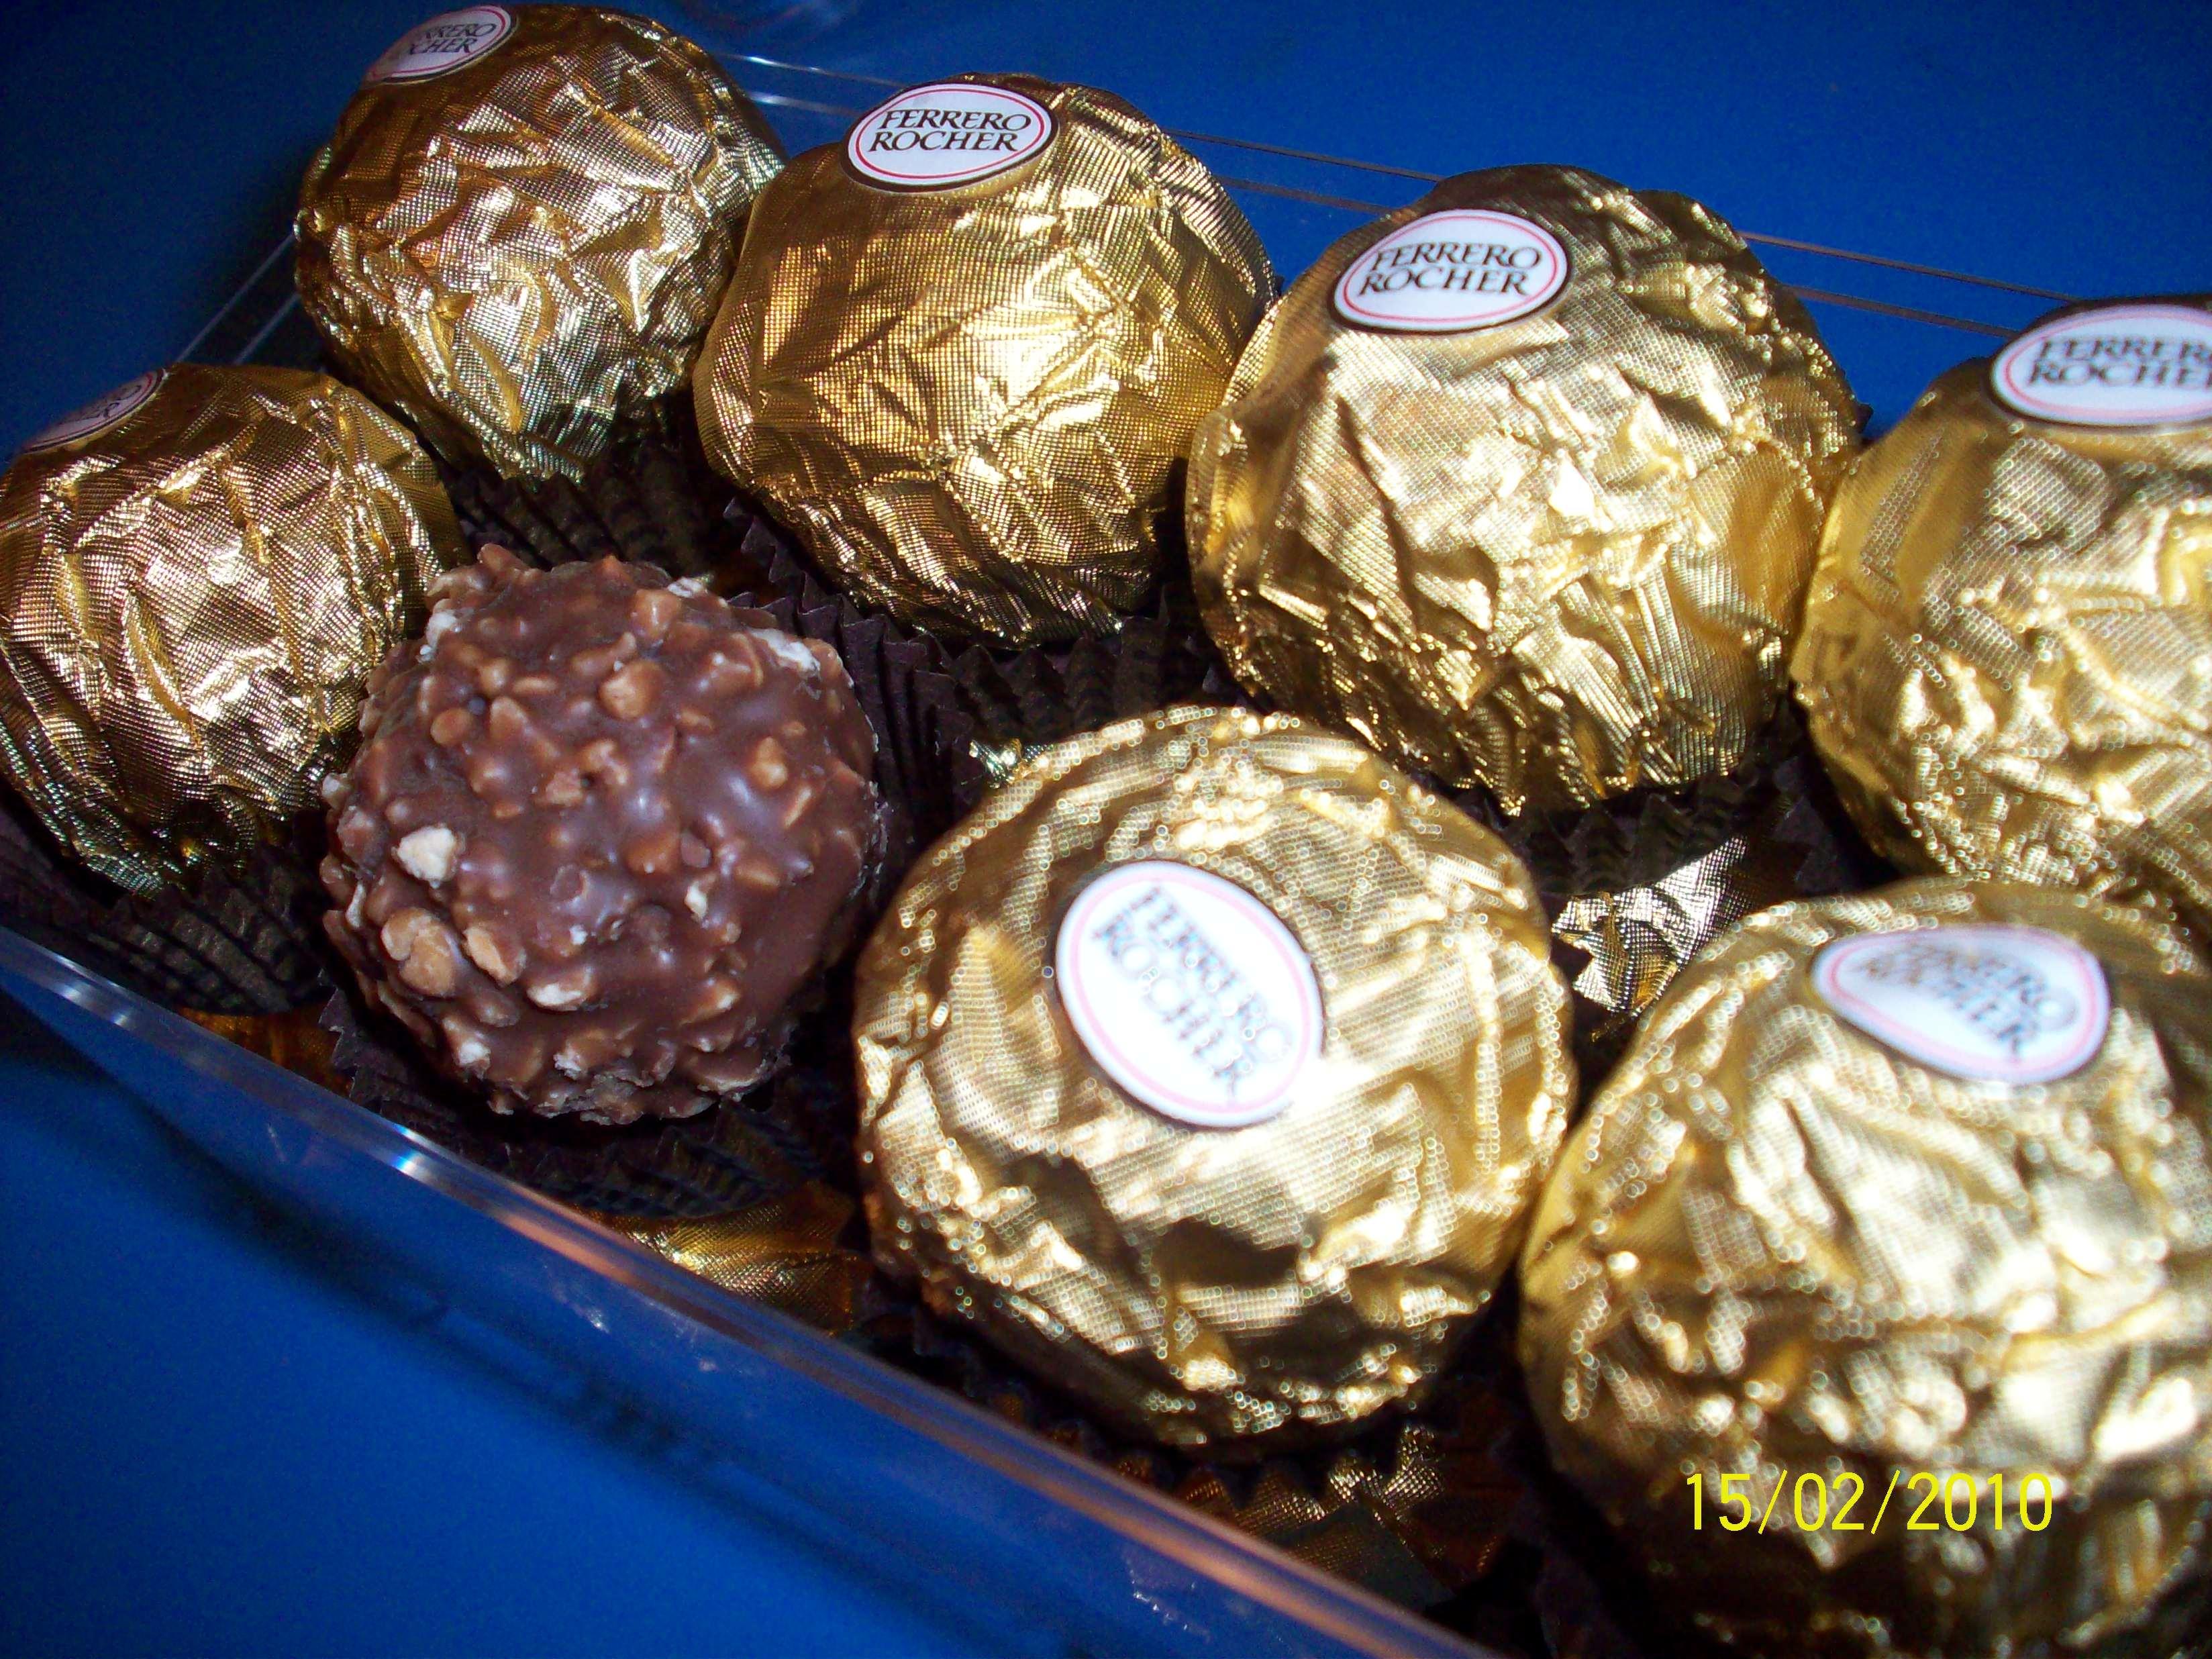 http://foodloader.net/cutie_2010-02-15_Ferrero_Rocher.jpg